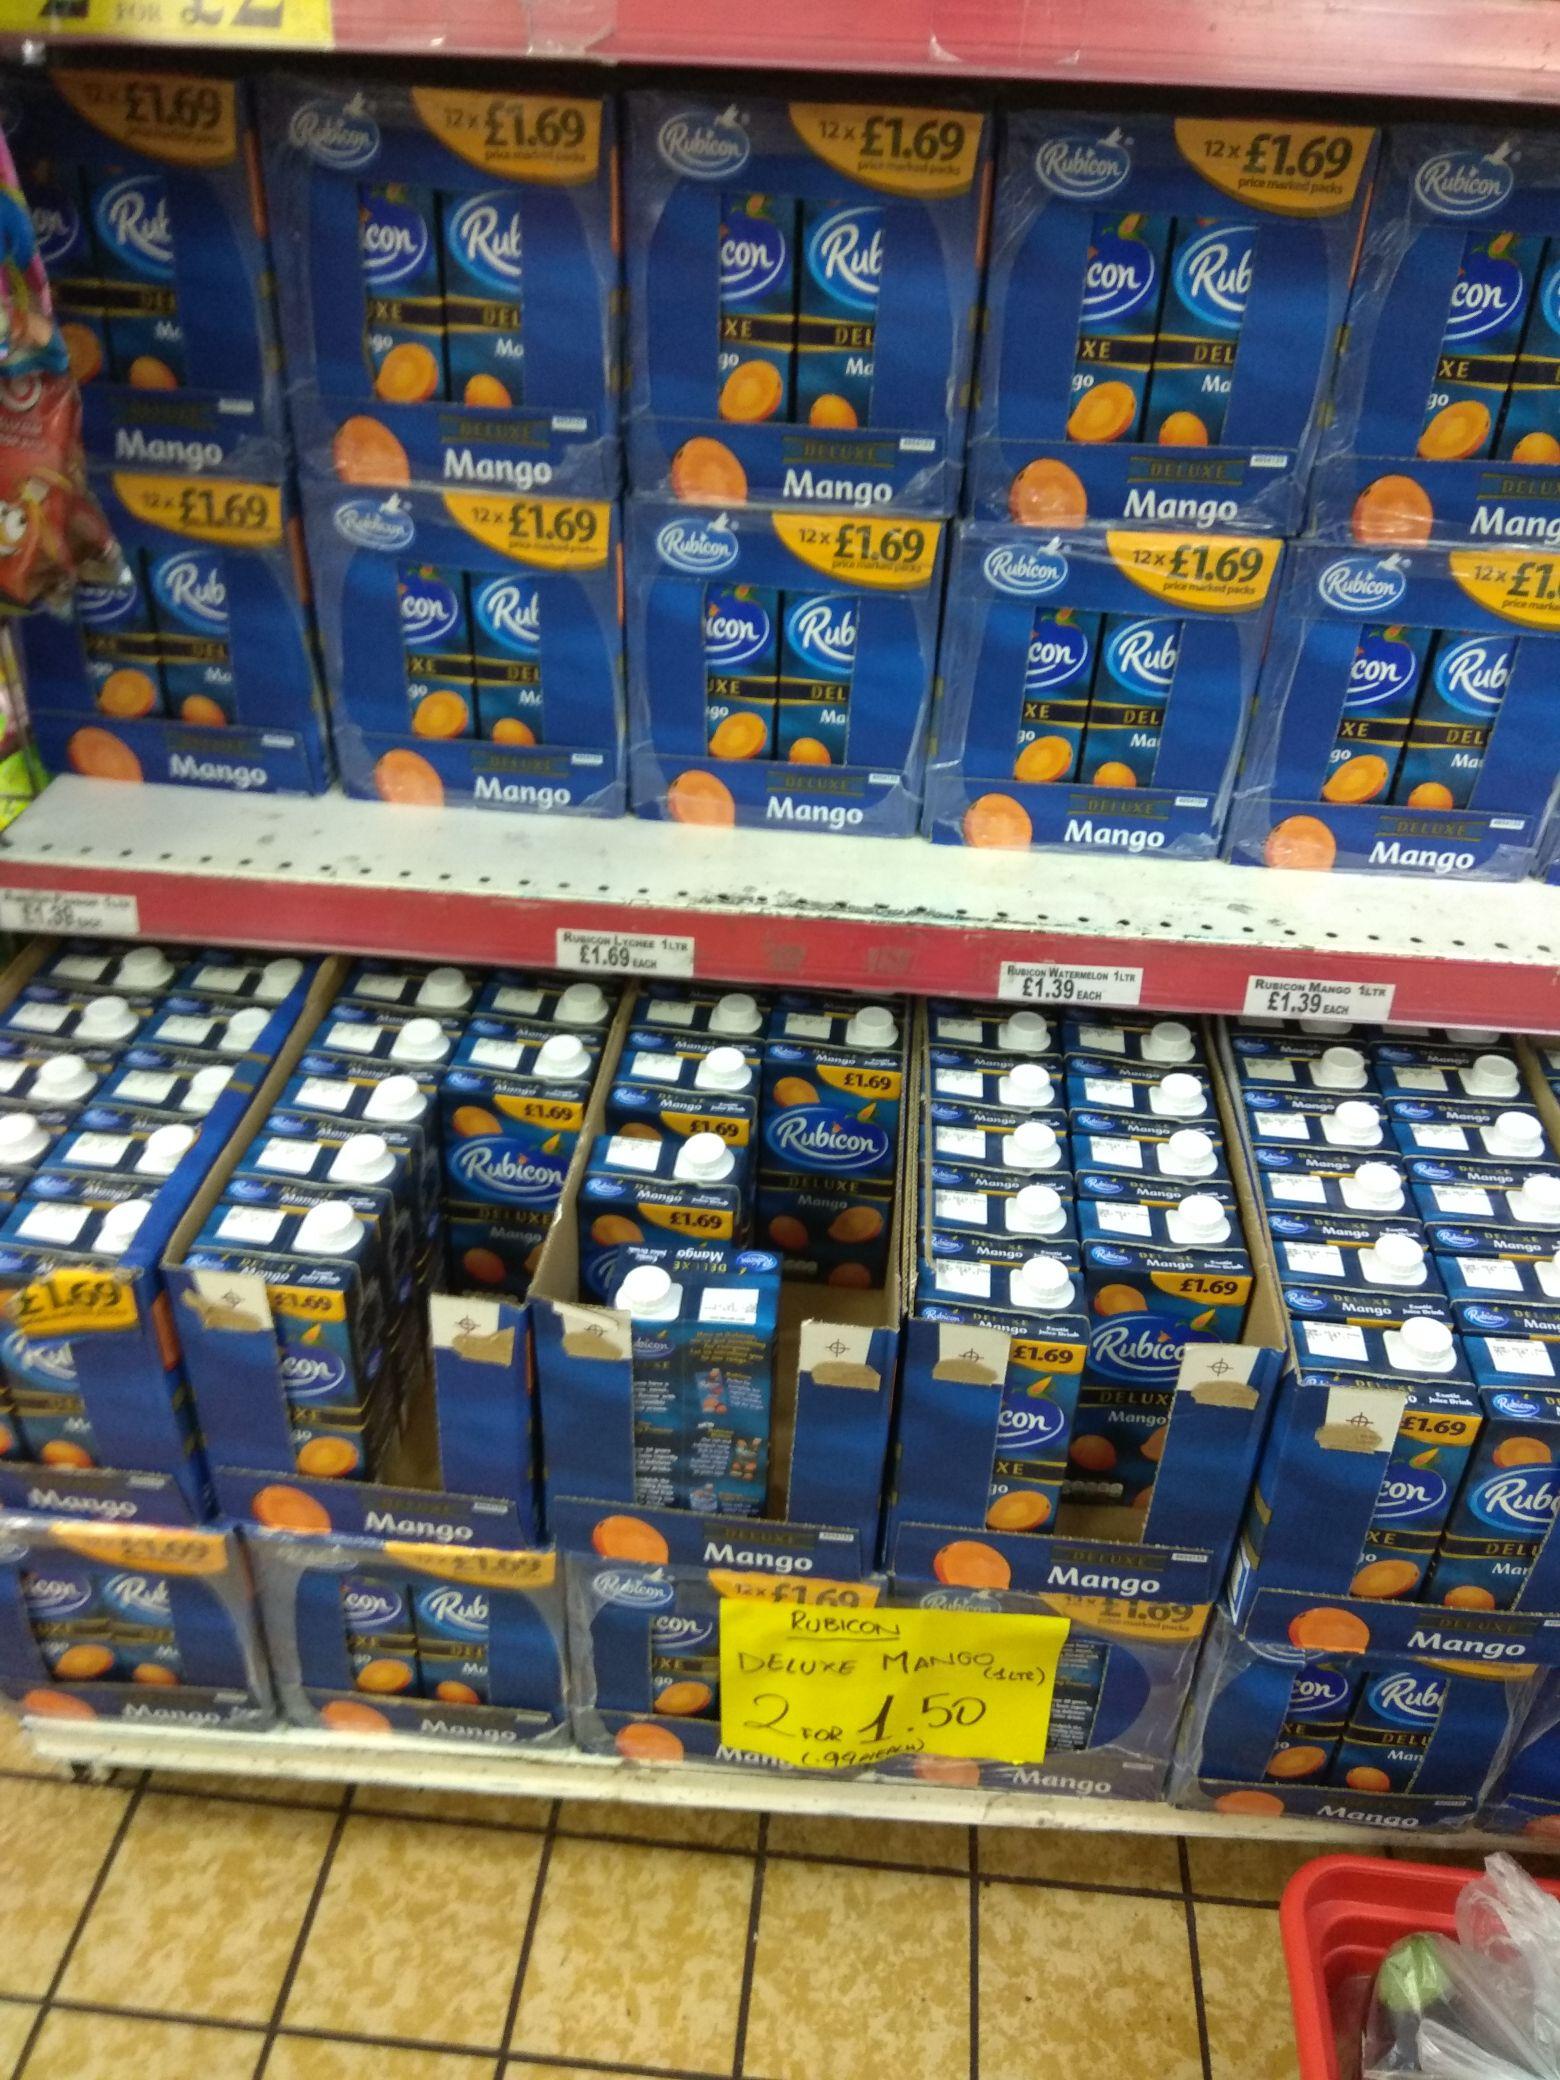 2 x Rubicon Deluxe Mango 1 litre cartons - £1.50 Instore @ Worldwide Foods